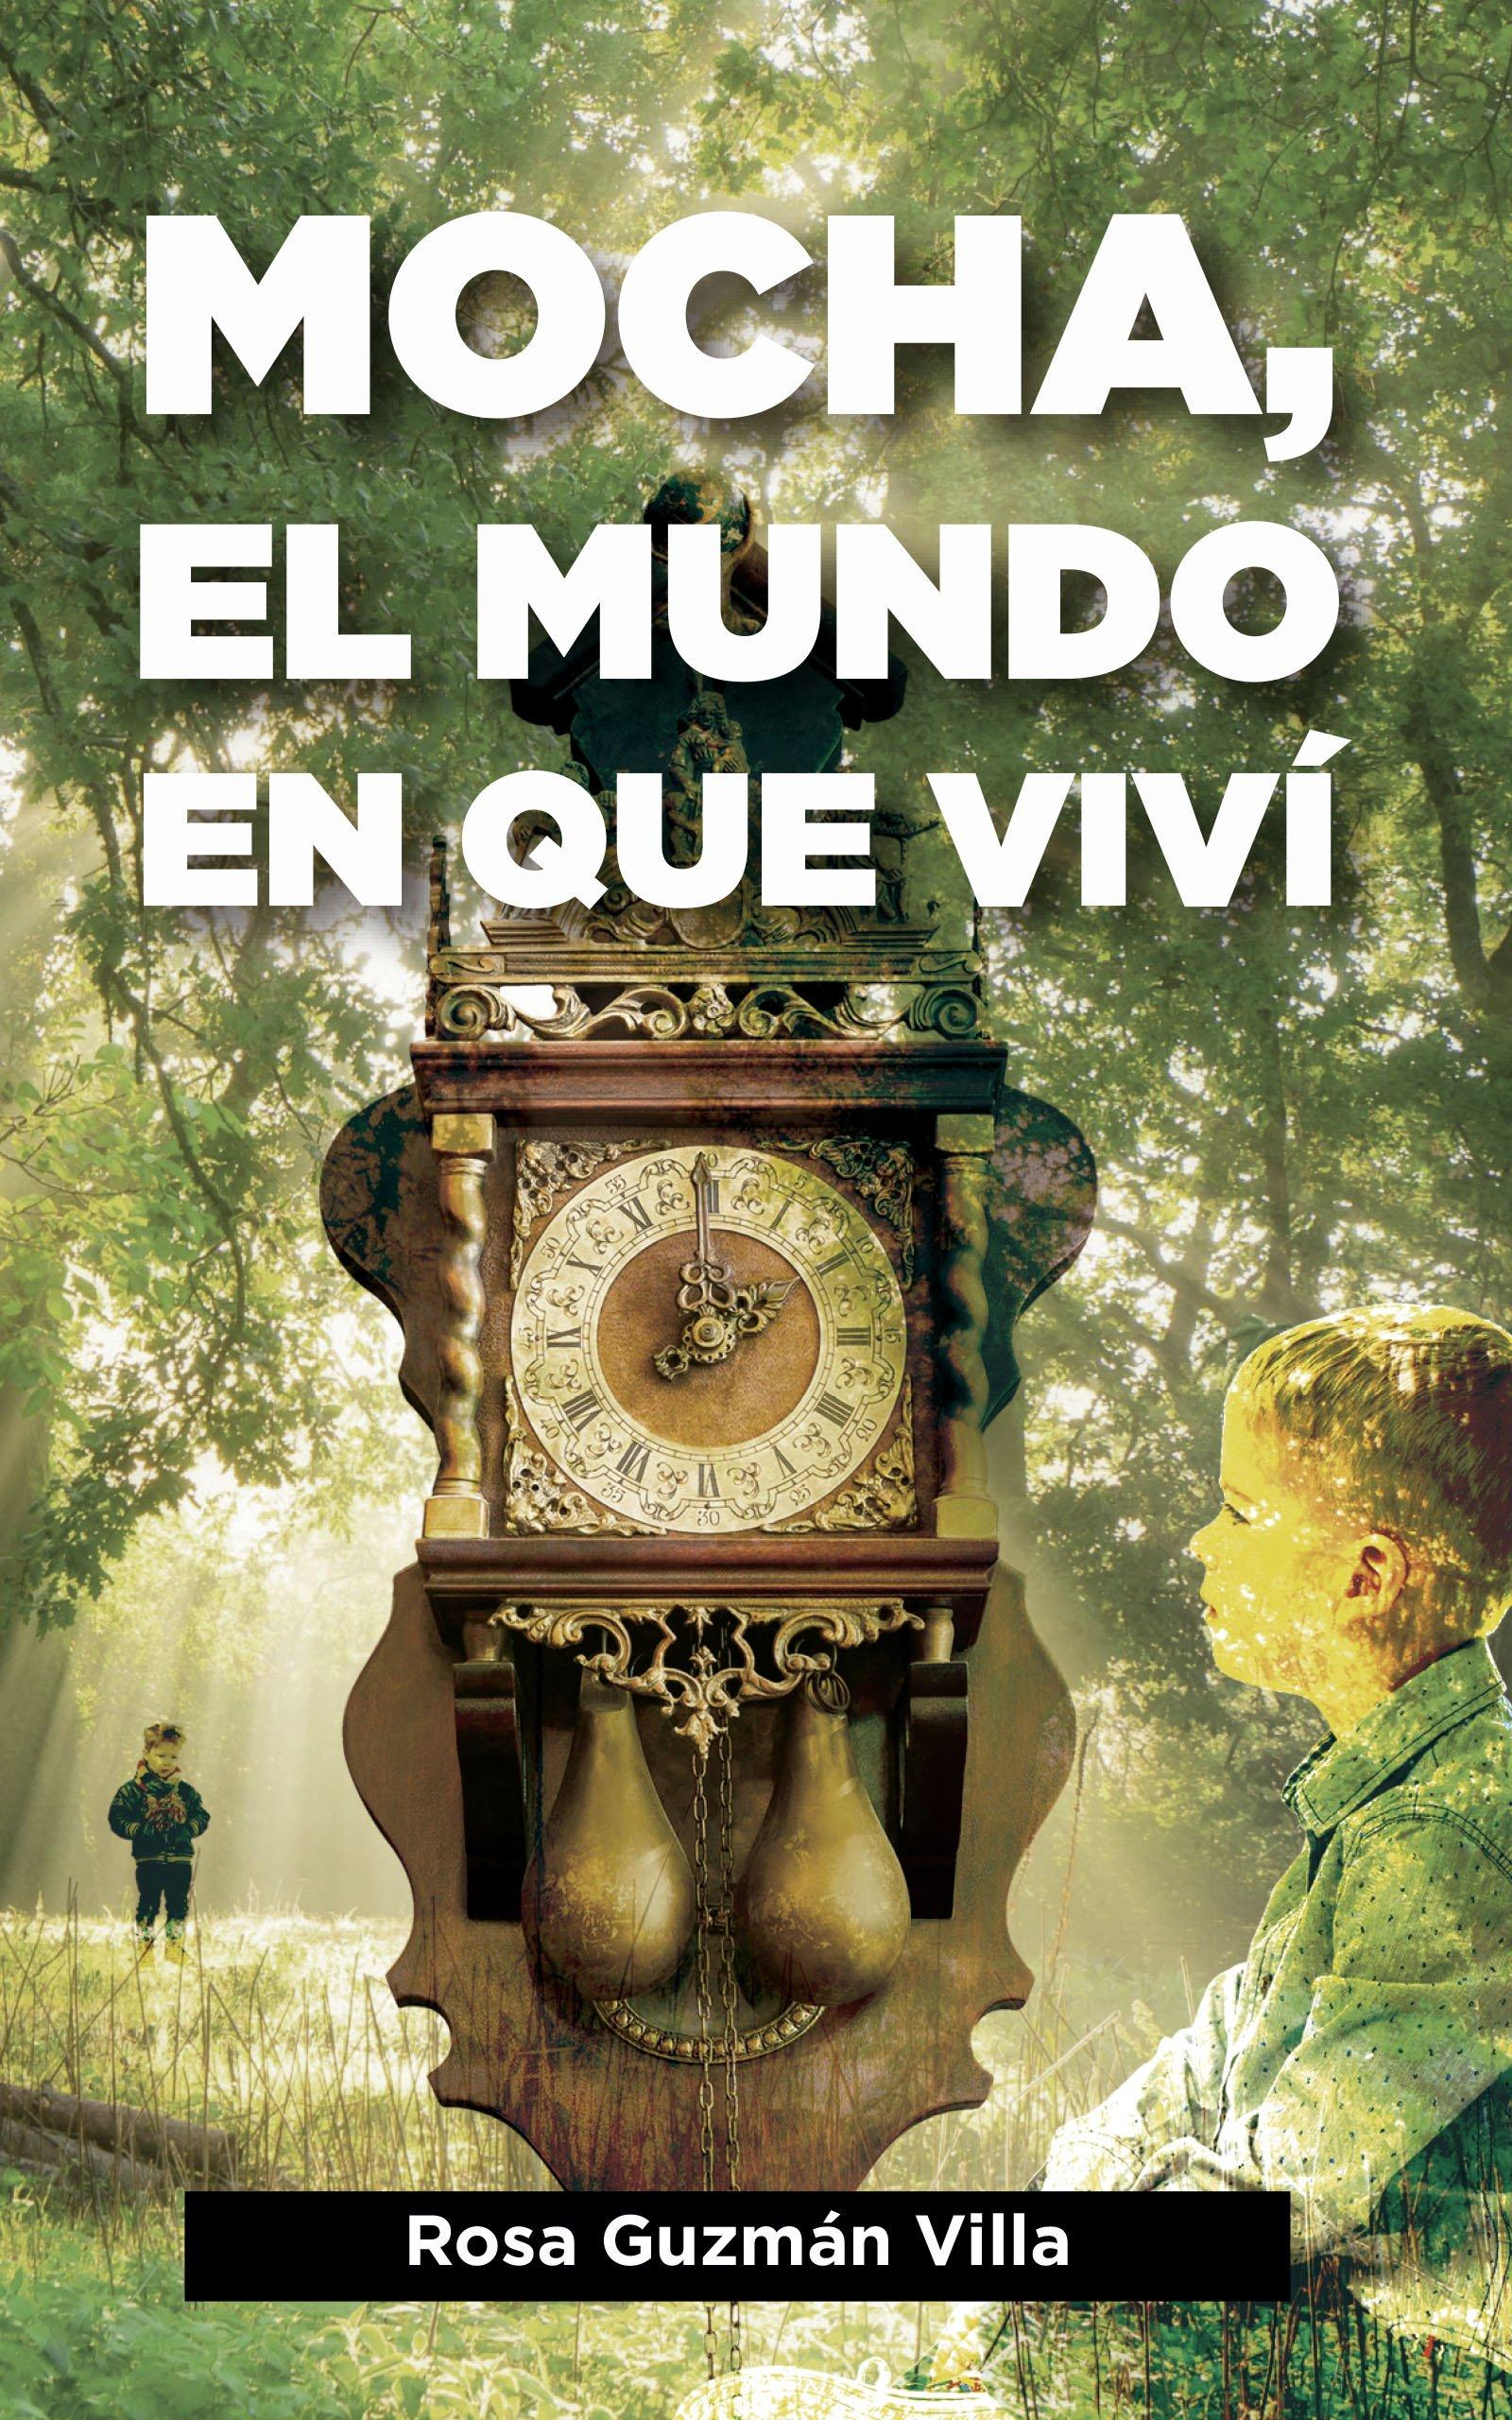 Mocha, el mundo en que viví, de Rosa Guzmán Villa